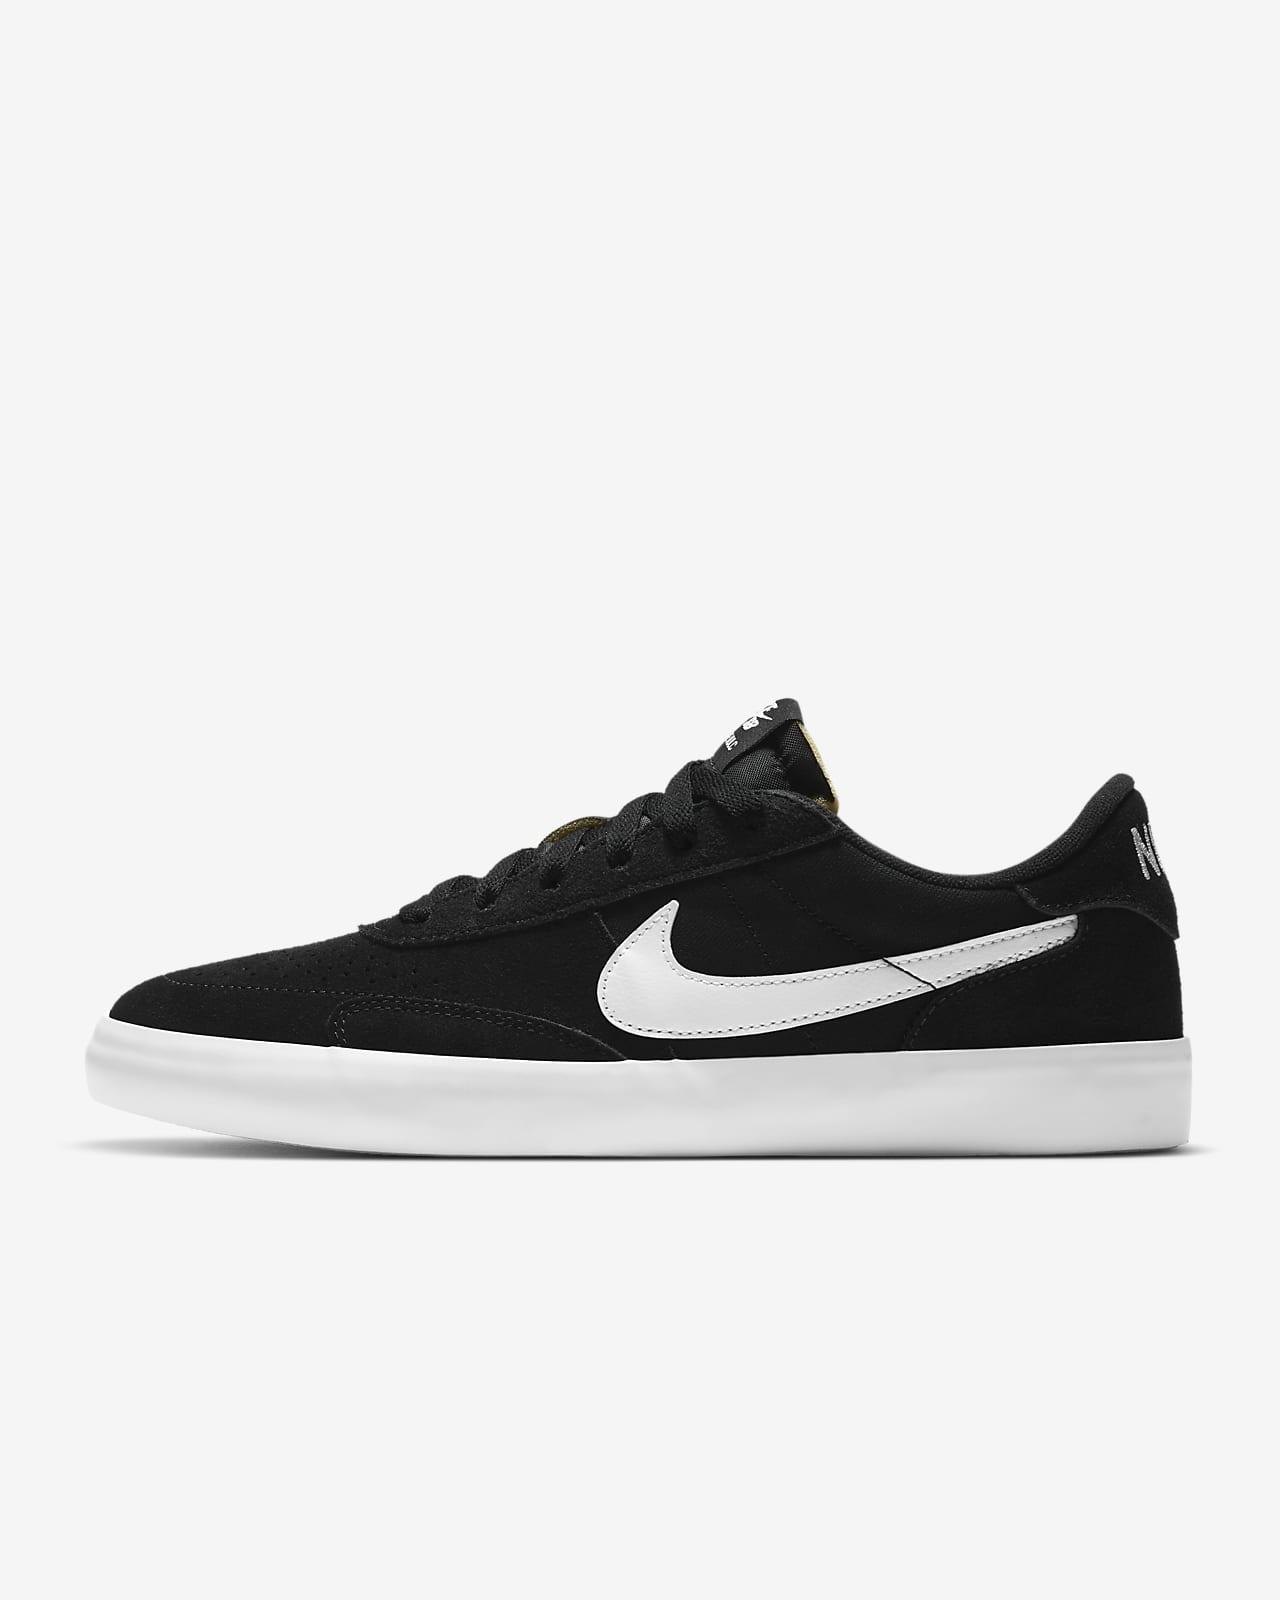 Calzado de Skateboarding Nike SB Heritage Vulc